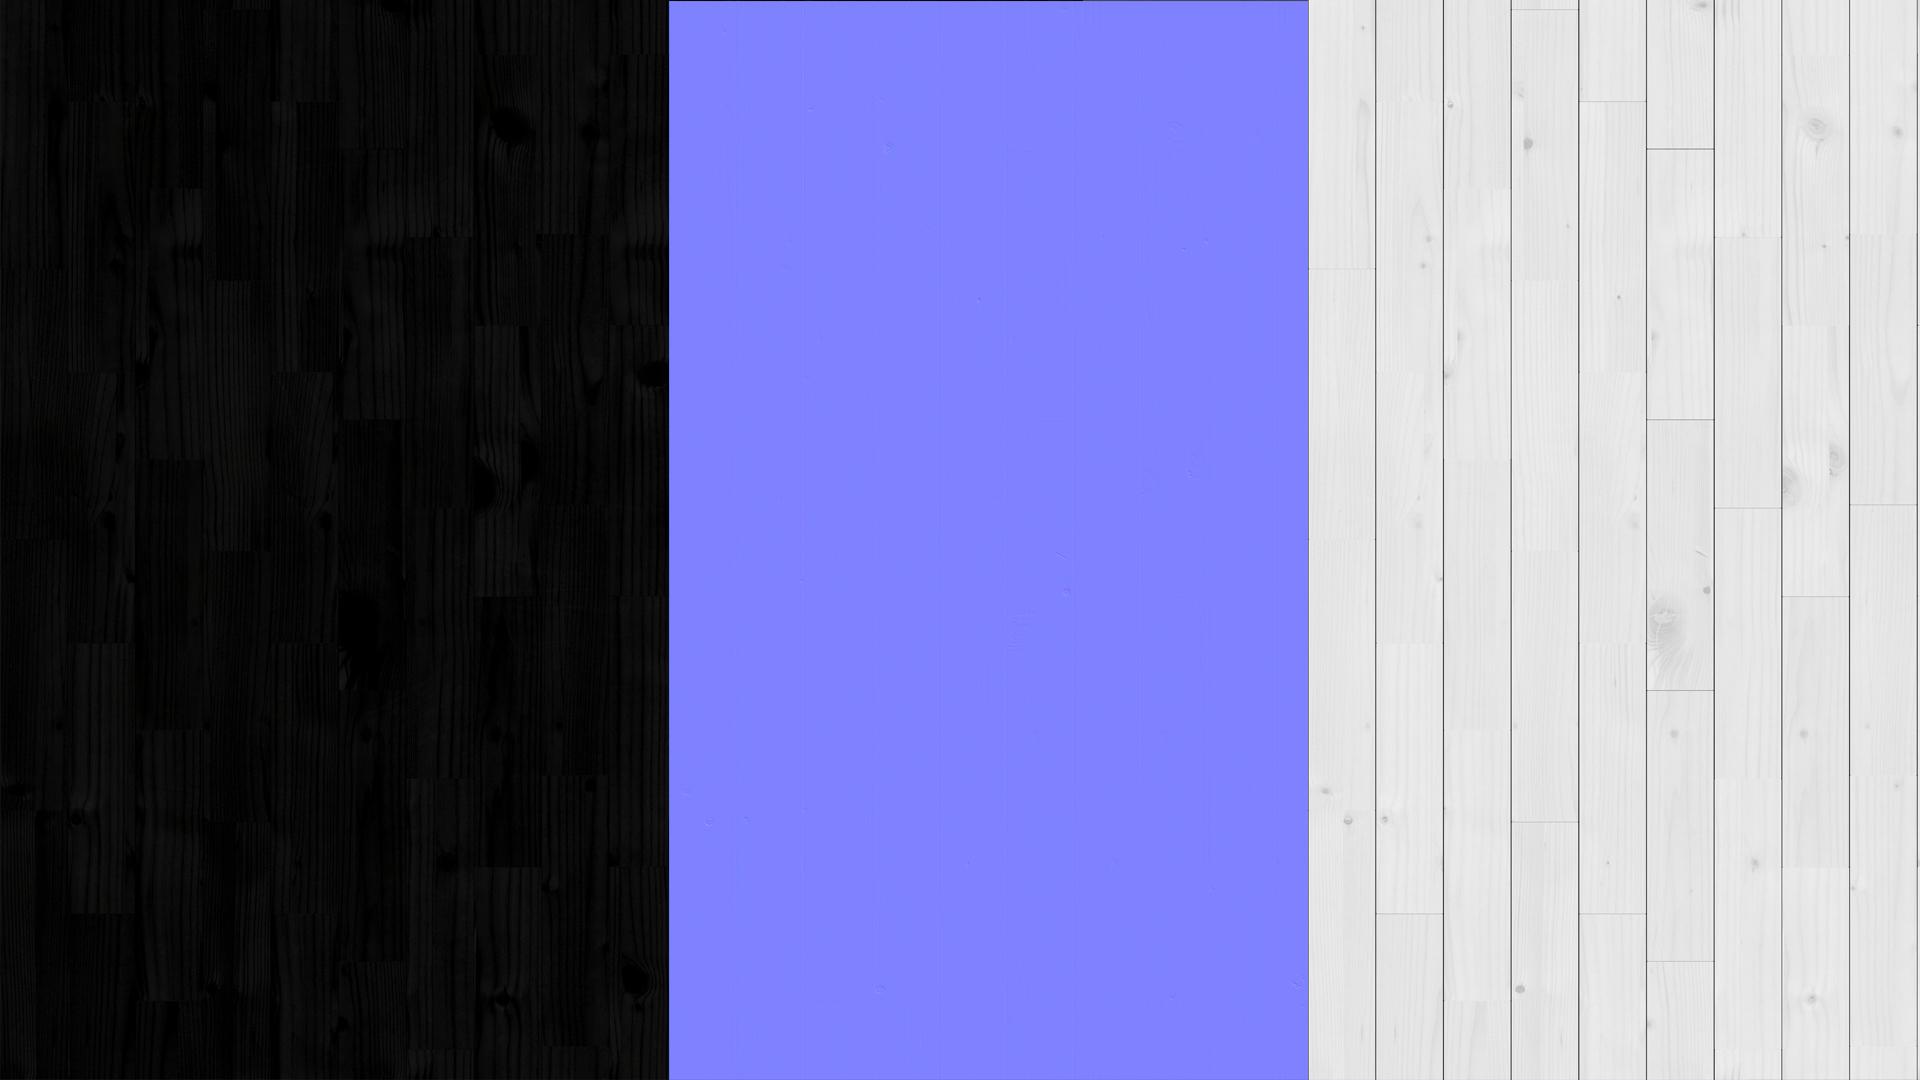 Black spruce planks